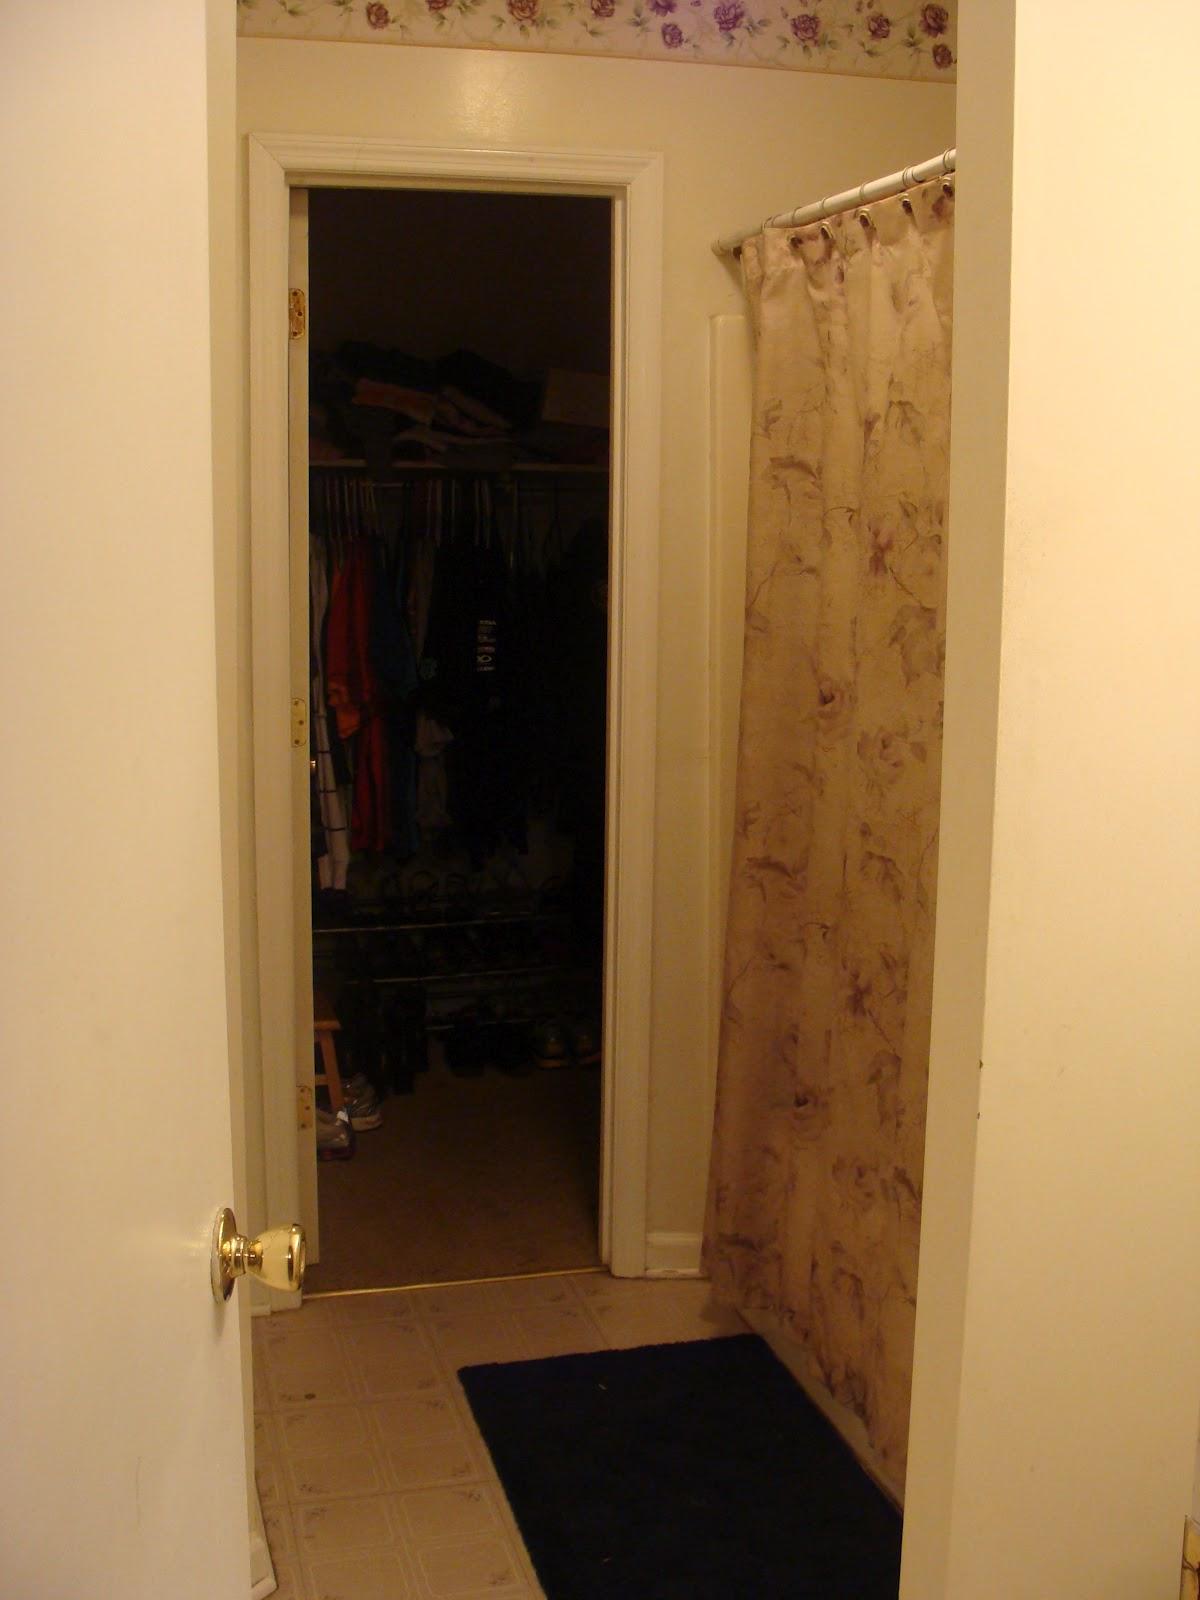 Matching Wallpaper And Shower Curtains Wallpapersafari